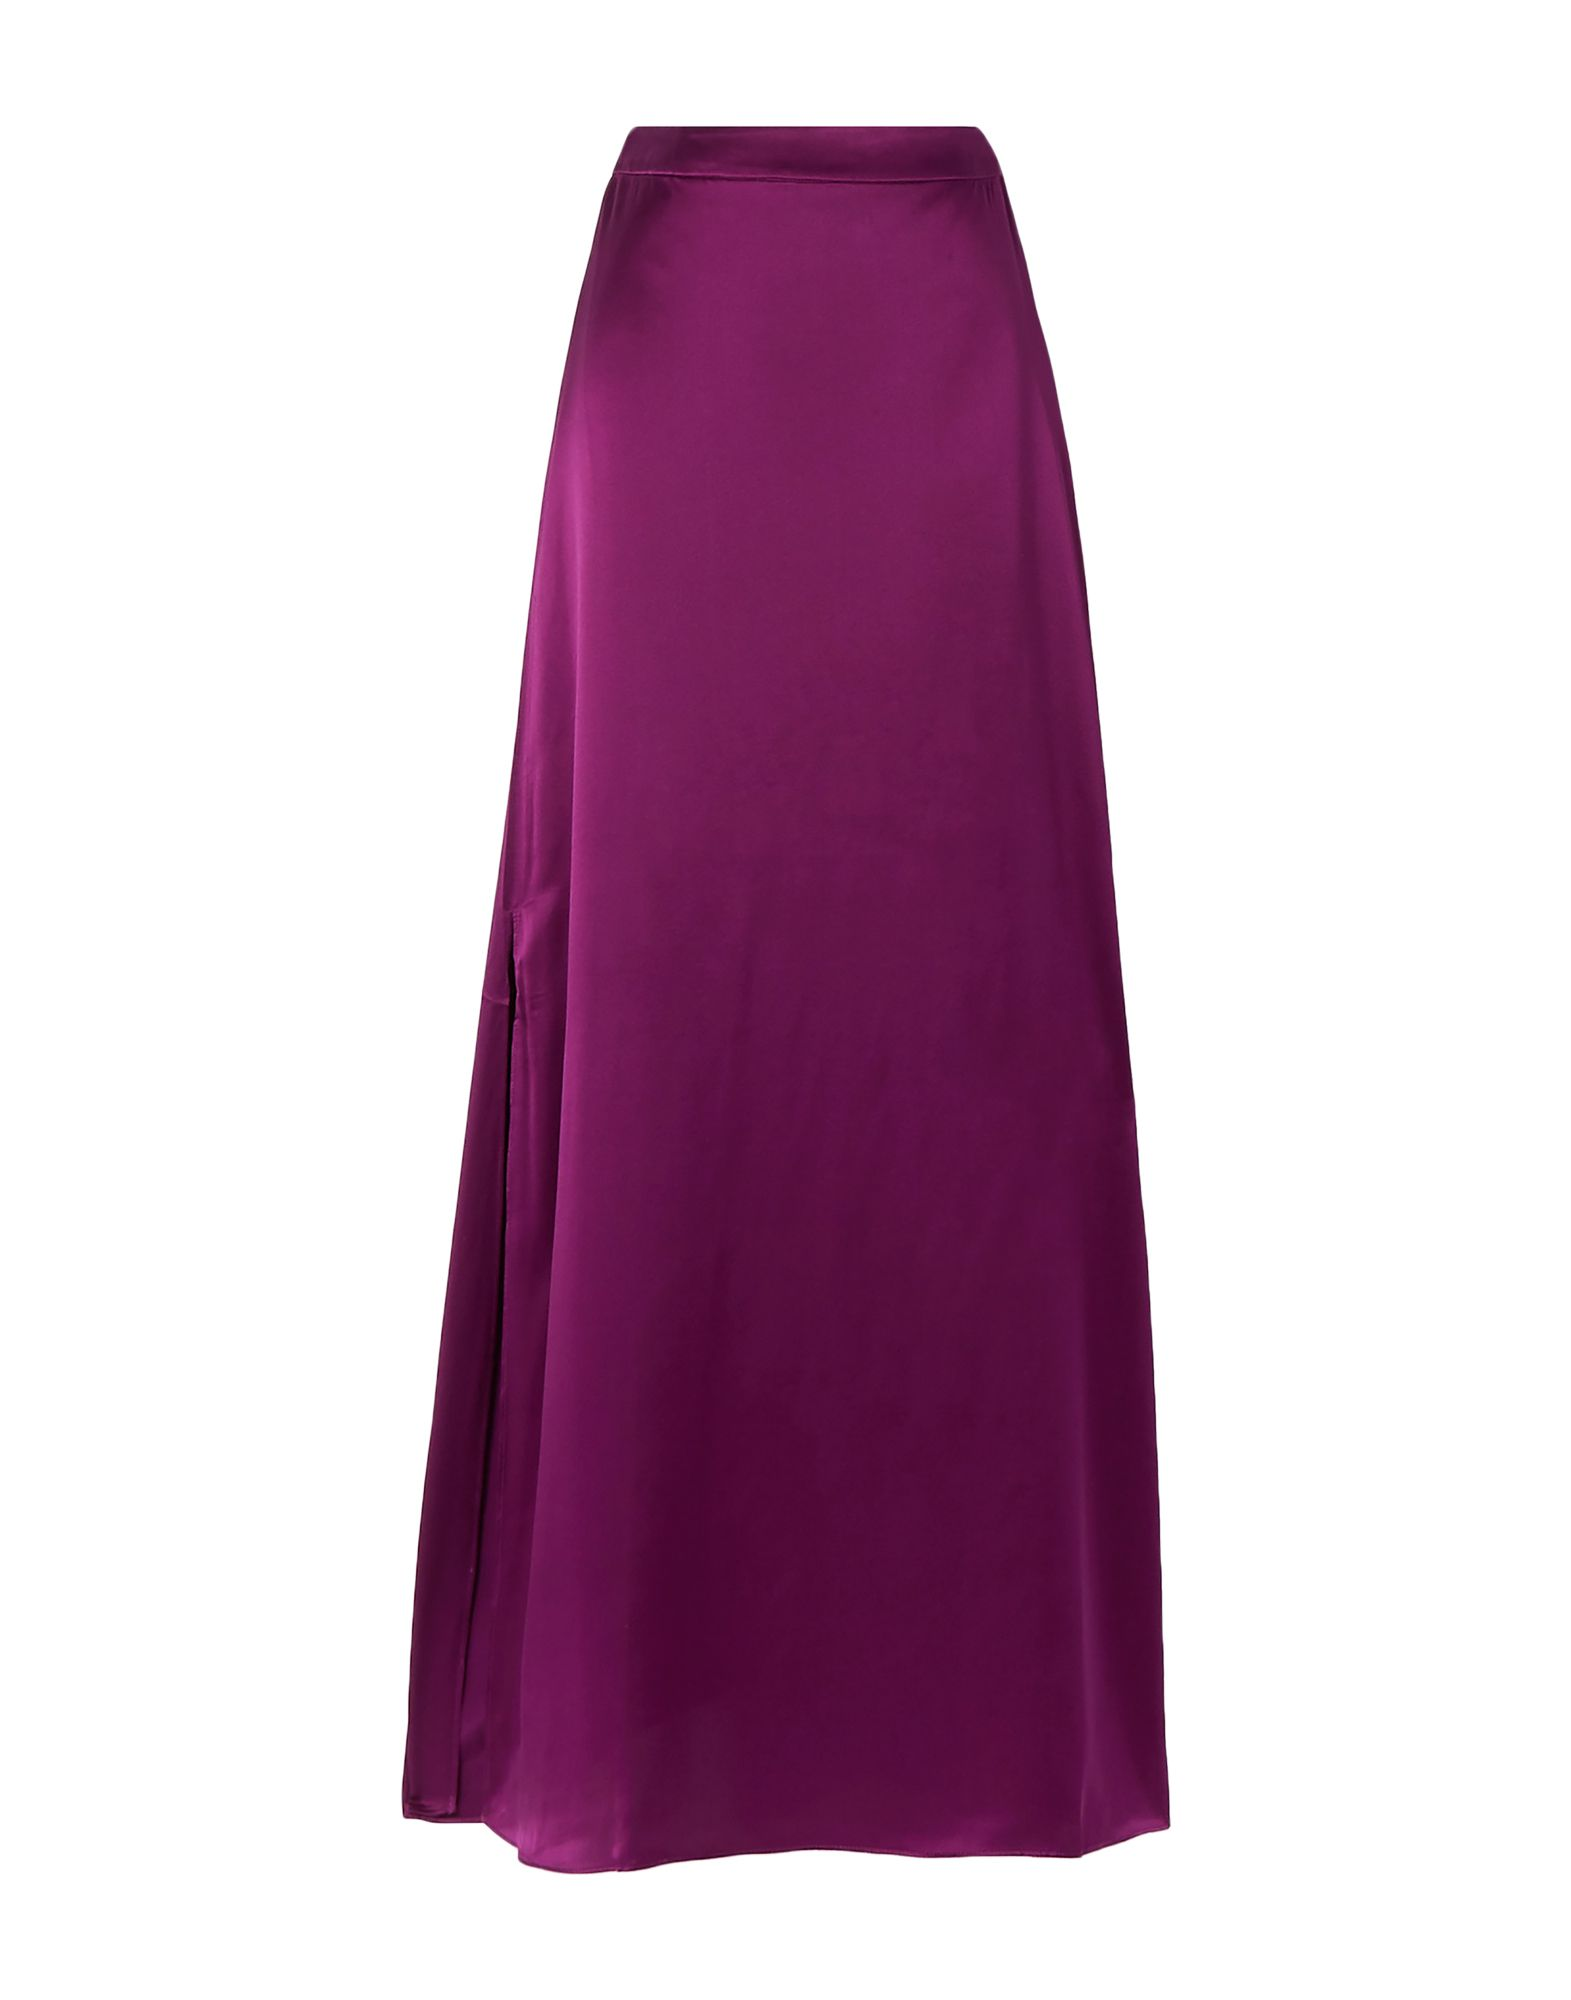 J.CREW Long skirts. satin, no appliqués, basic solid color, no pockets, rear closure, hook-and-bar, zip, unlined. 100% Silk